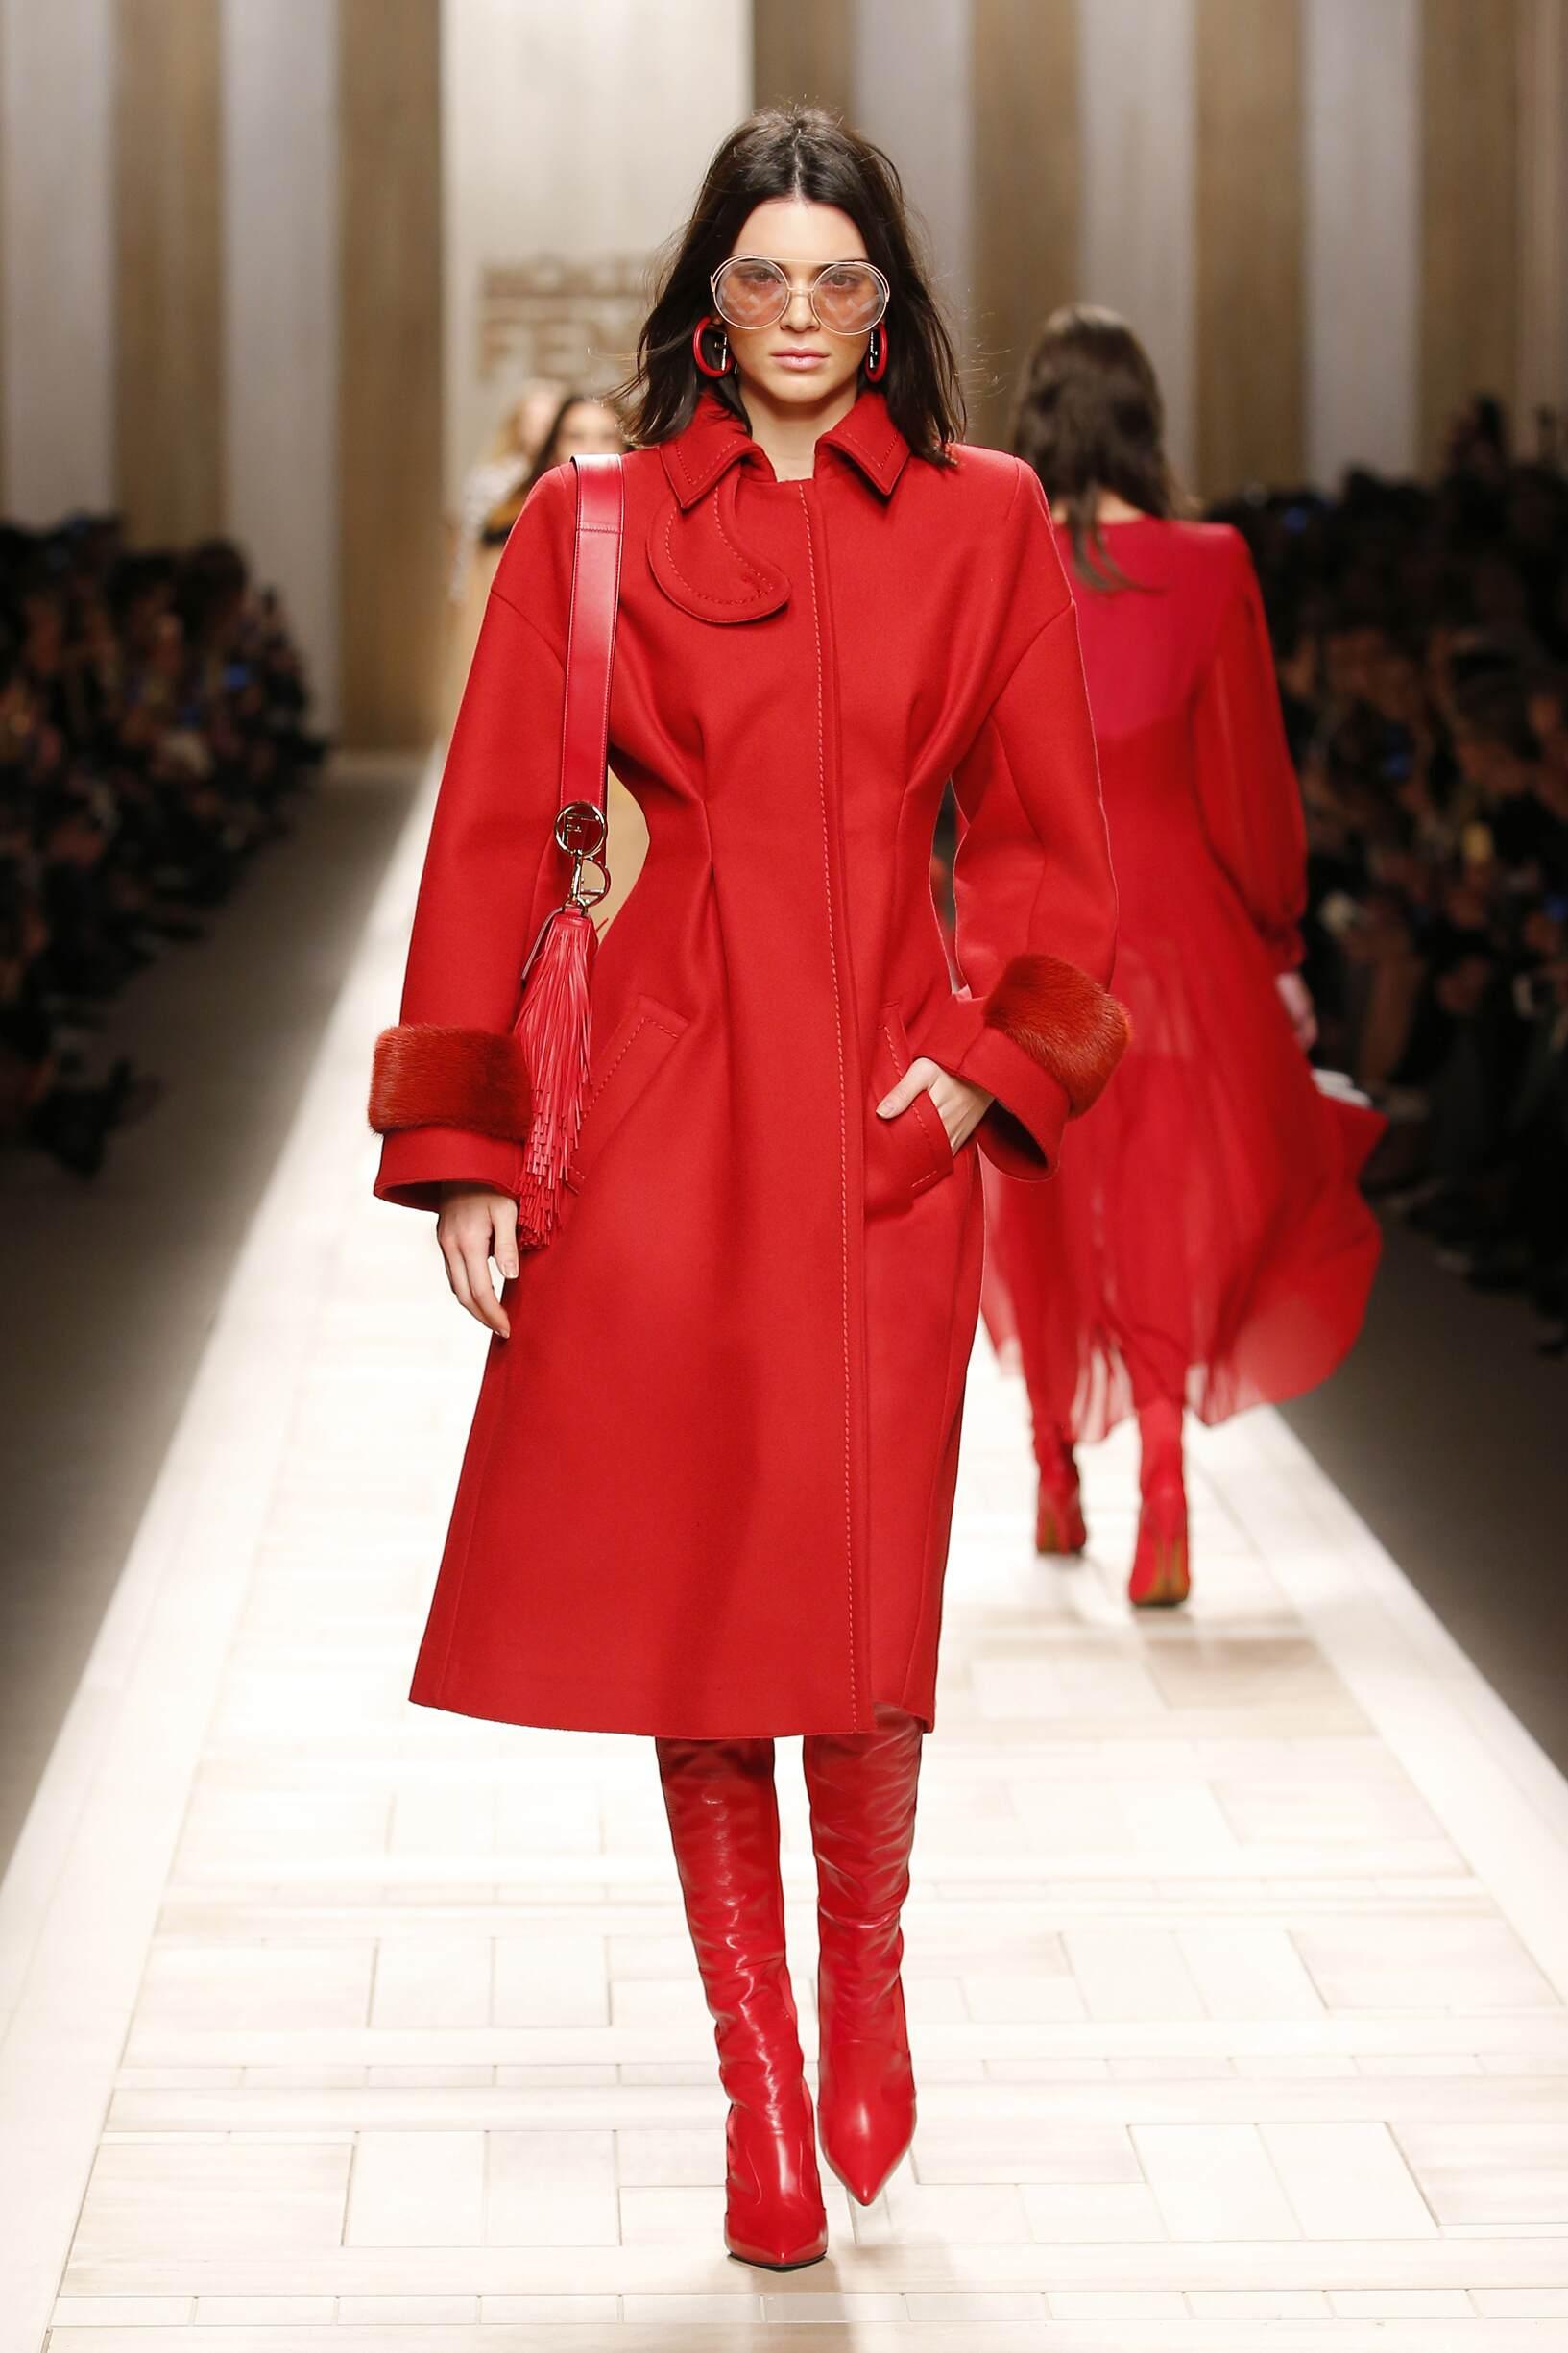 Fendi FW 2017 Womenswear